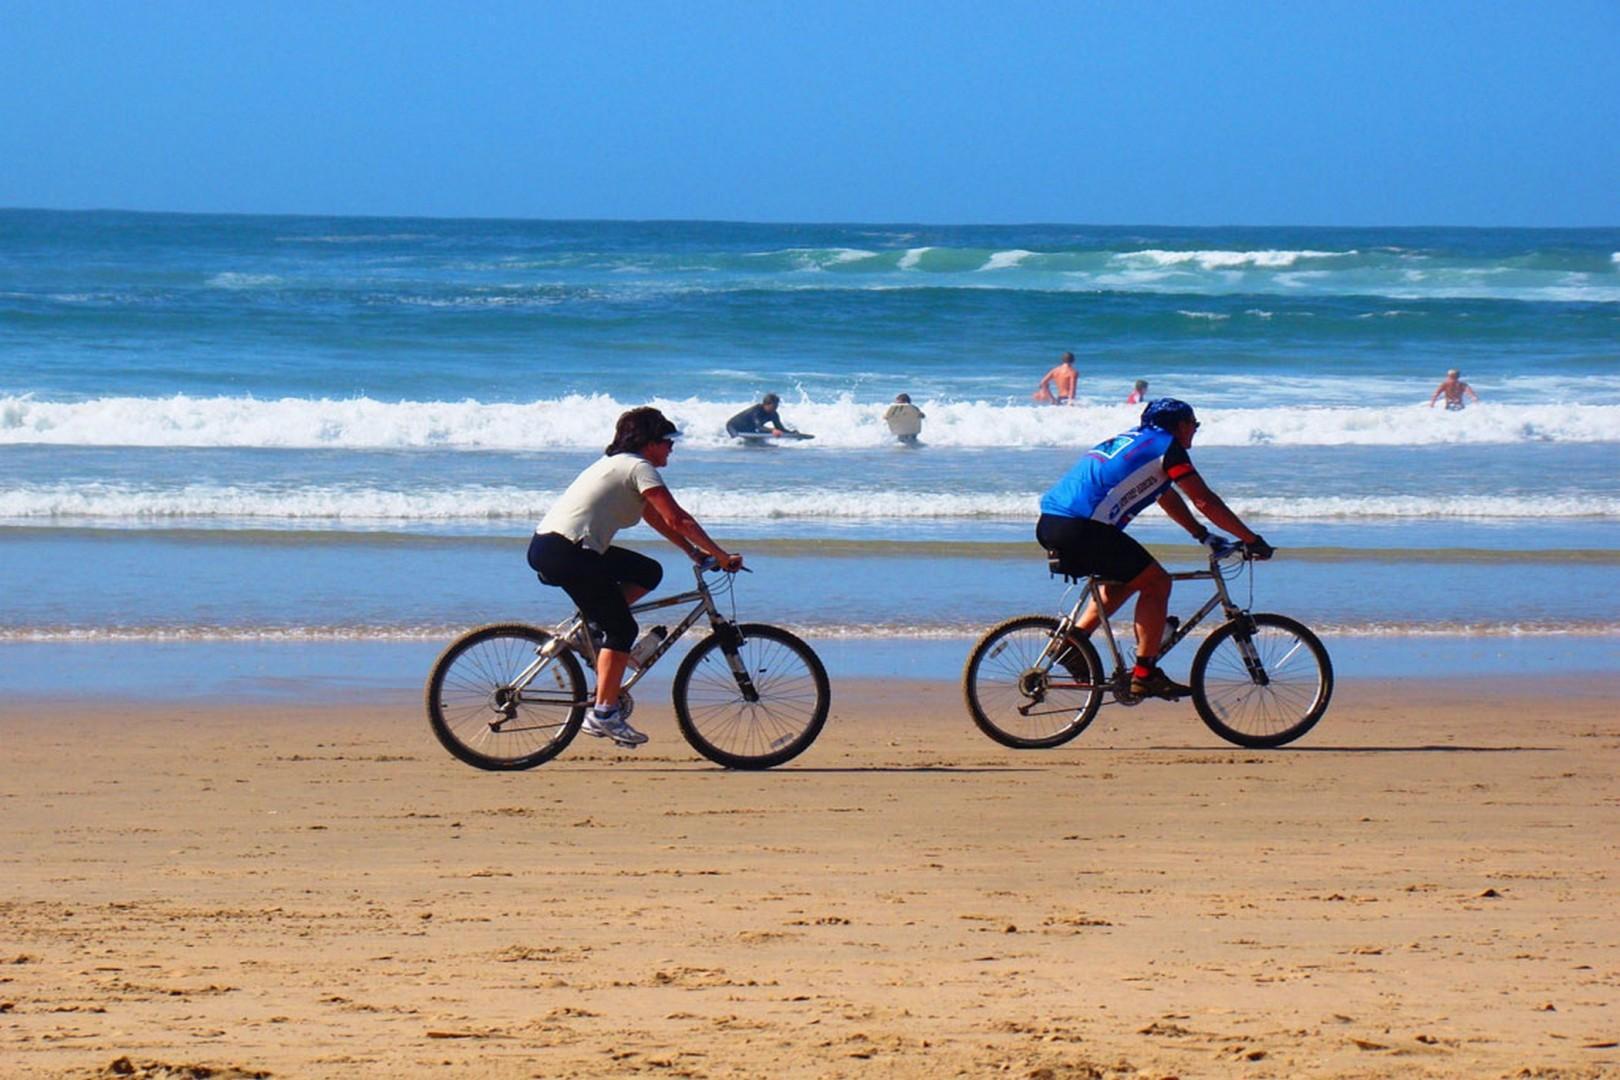 Scenery beach biking